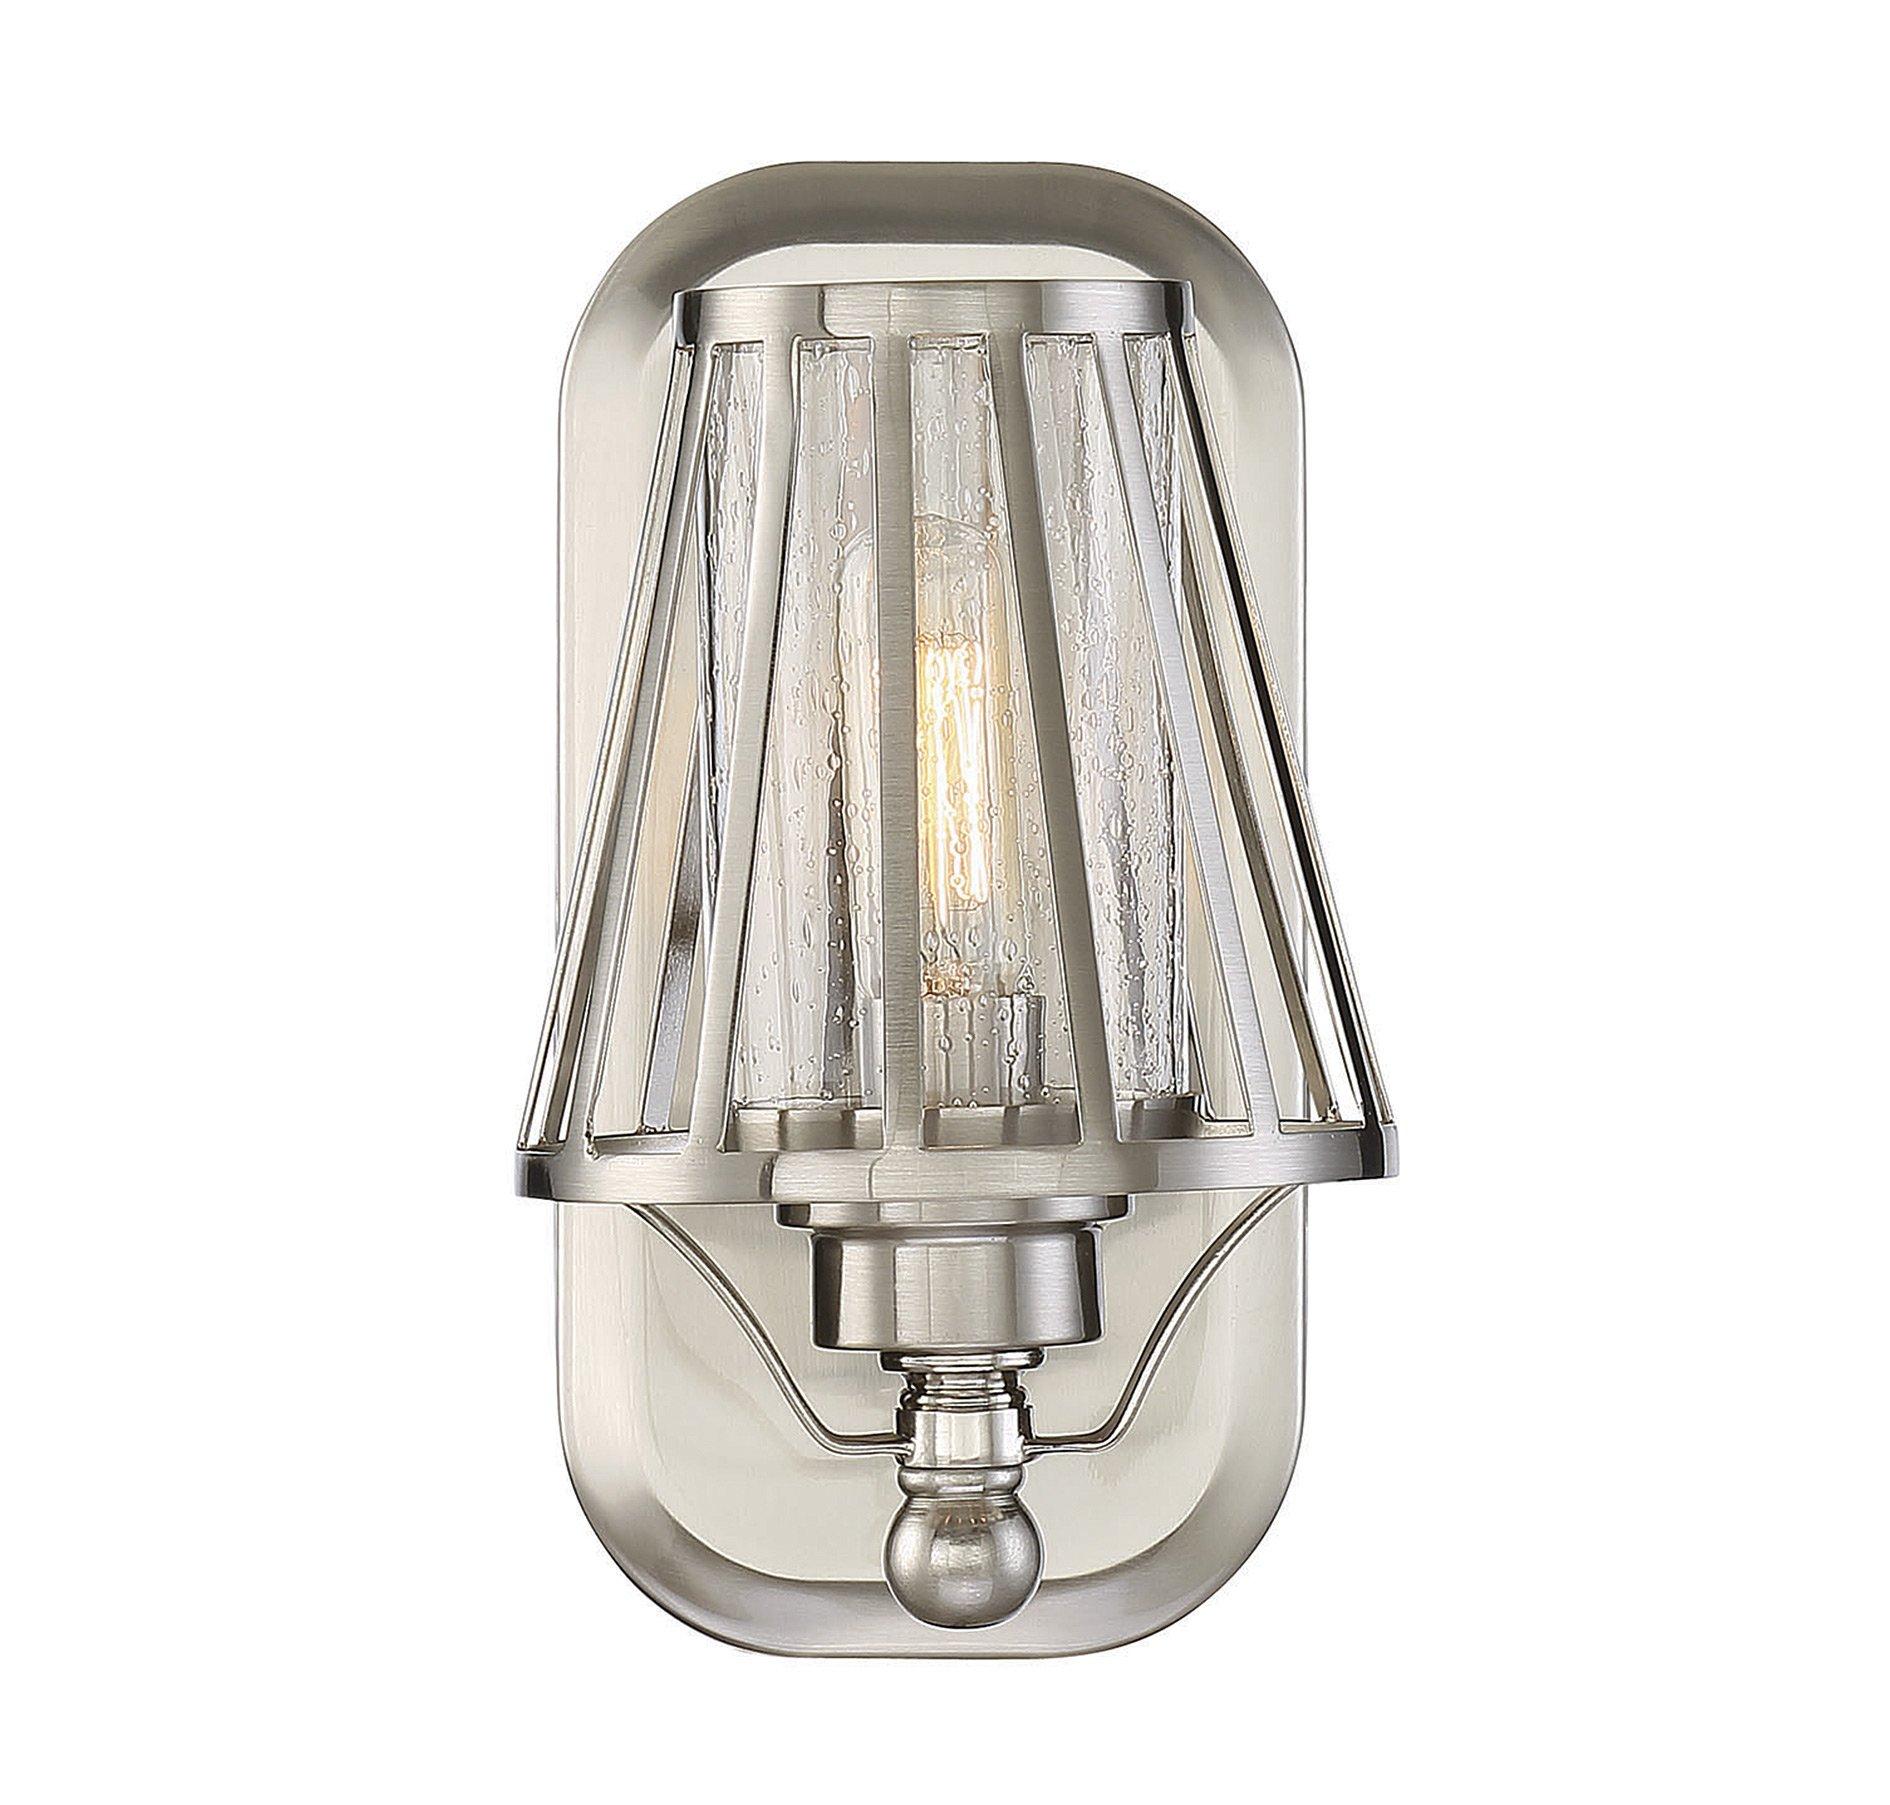 Savoy House 9-4078-1-SN Caroll 1-Light Sconce in Satin Nickel